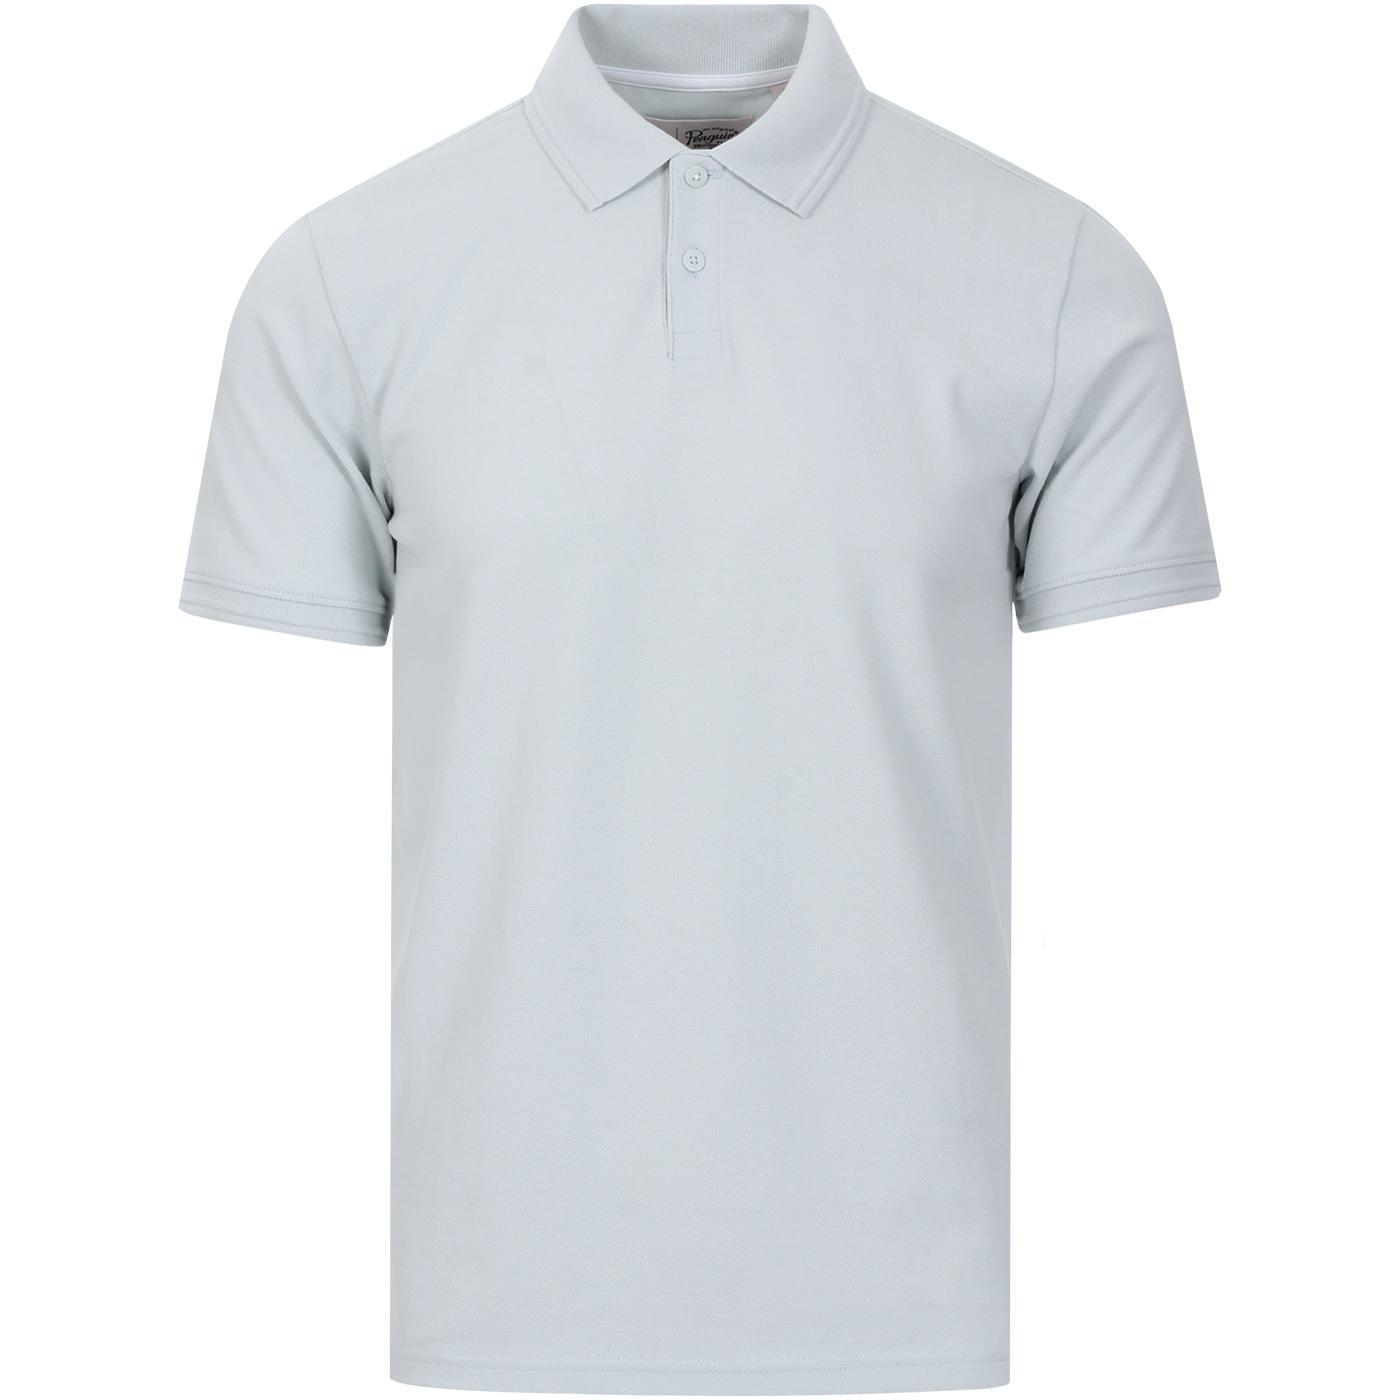 ORIGINAL PENGUIN Raised Rib Retro Mod Polo Shirt B